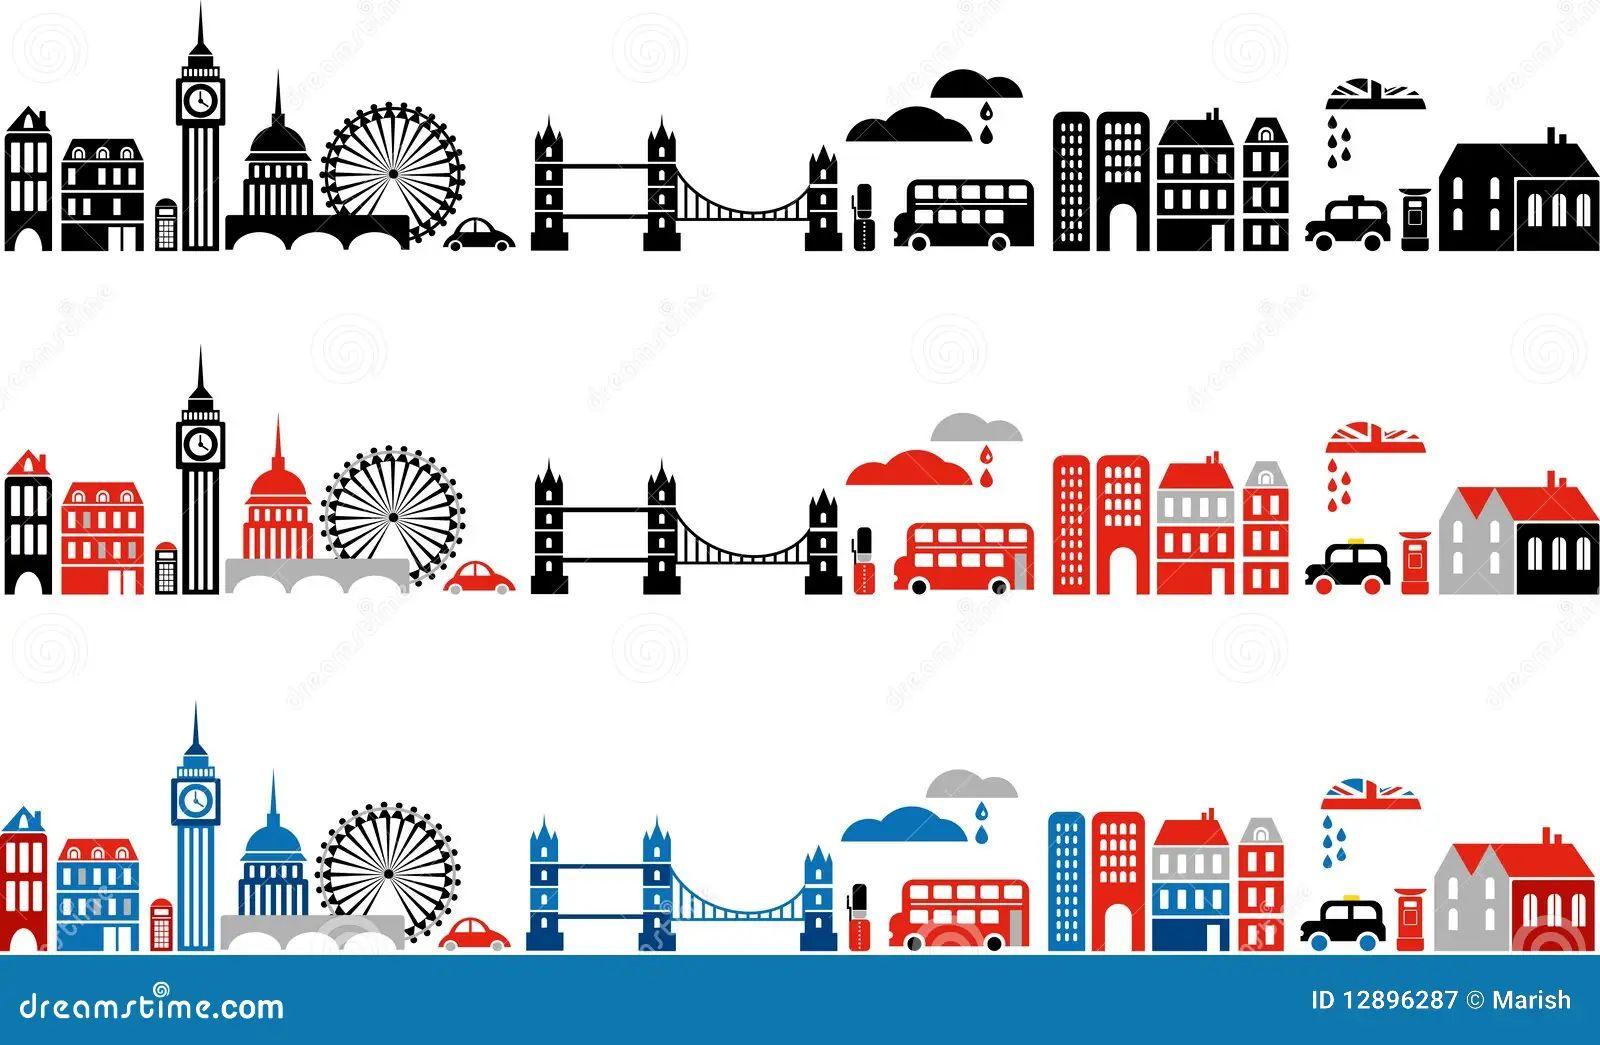 Vector illustration of london city 2 royalty free stock